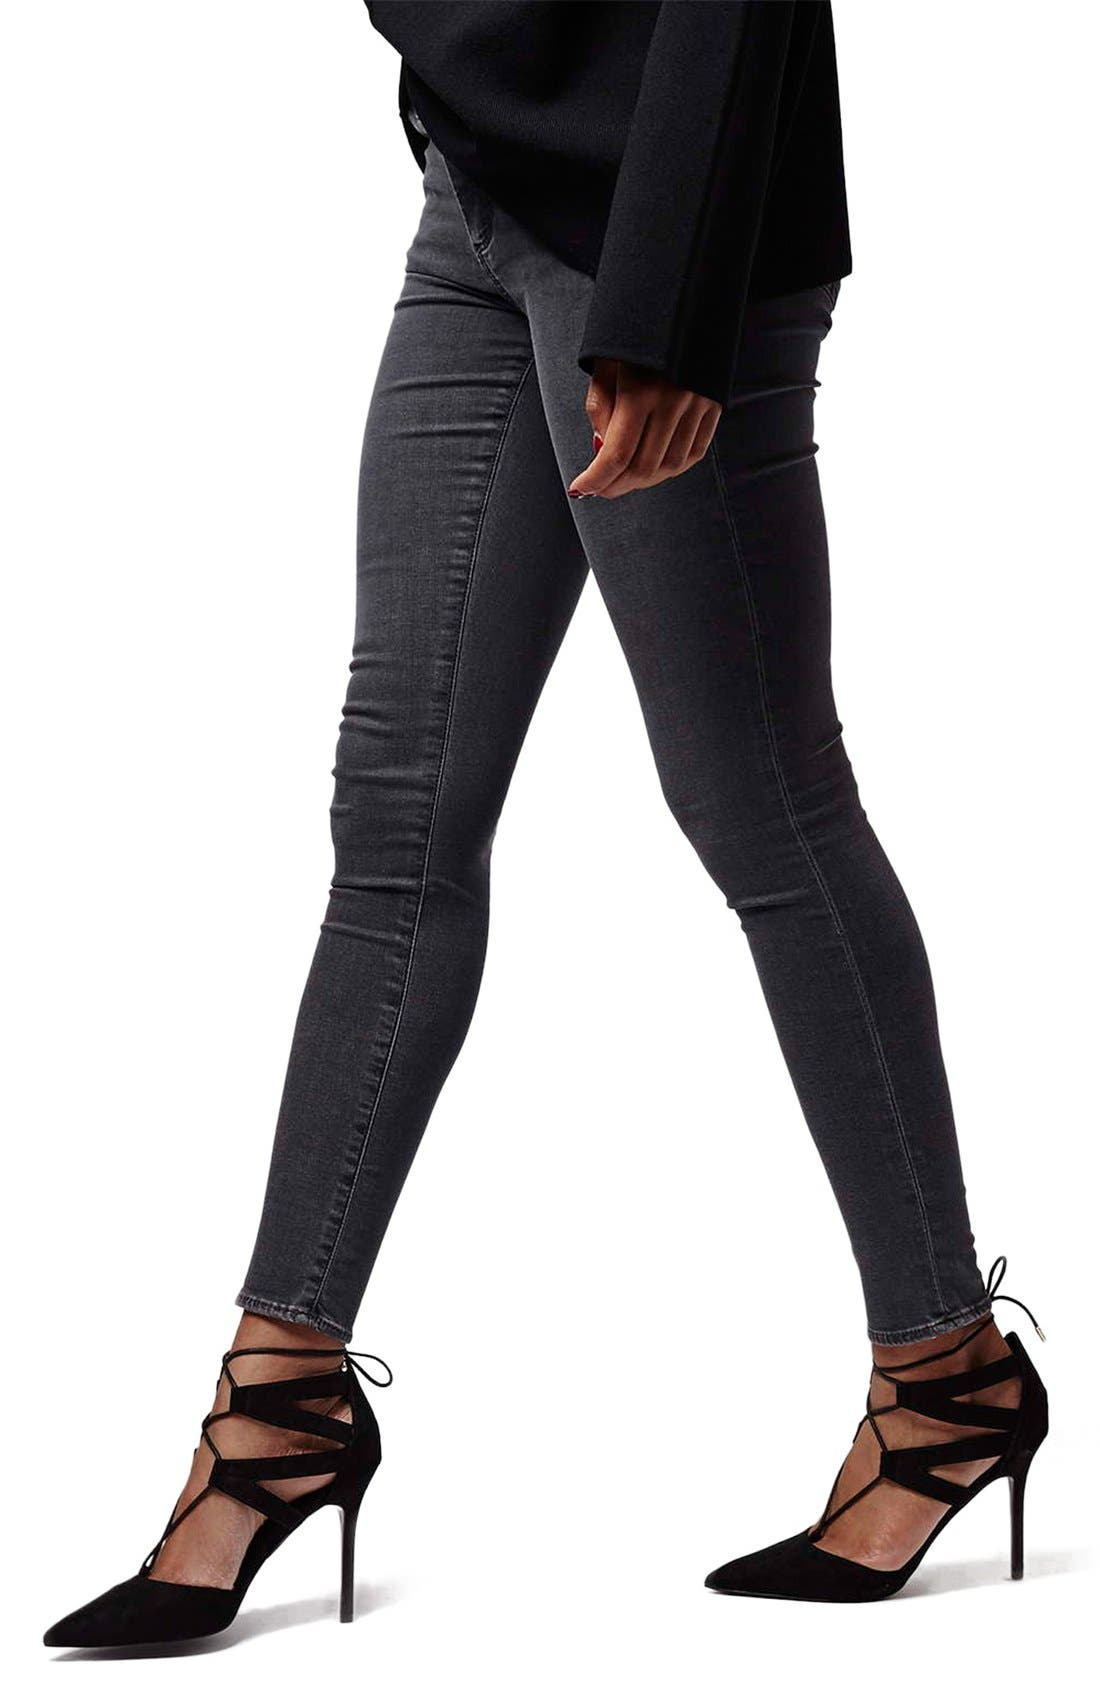 Alternate Image 1 Selected - Topshop Moto 'Jamie' Skinny Jeans (Tall)